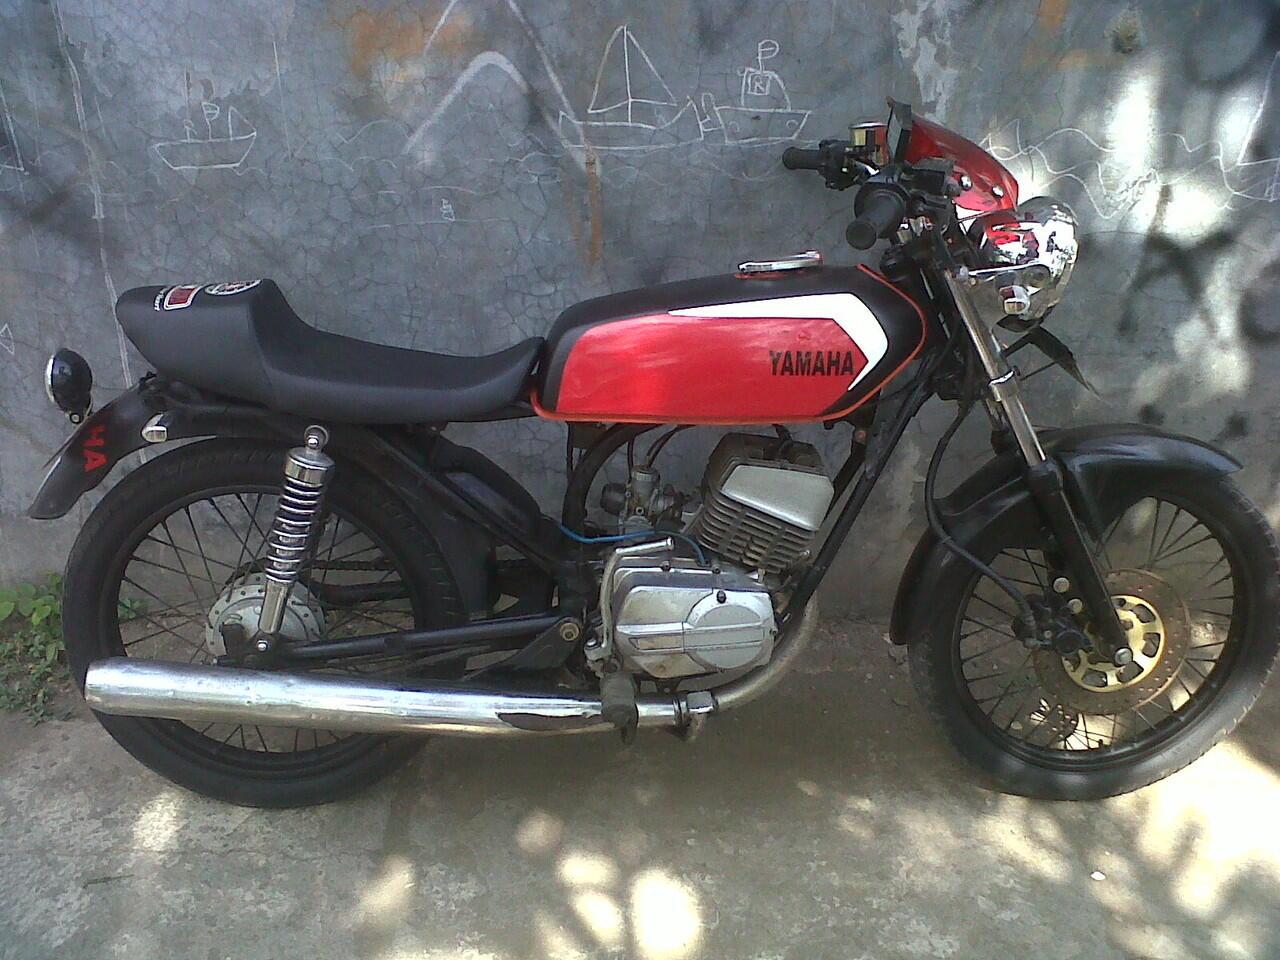 YAMAHA RX 100 CLASSIC